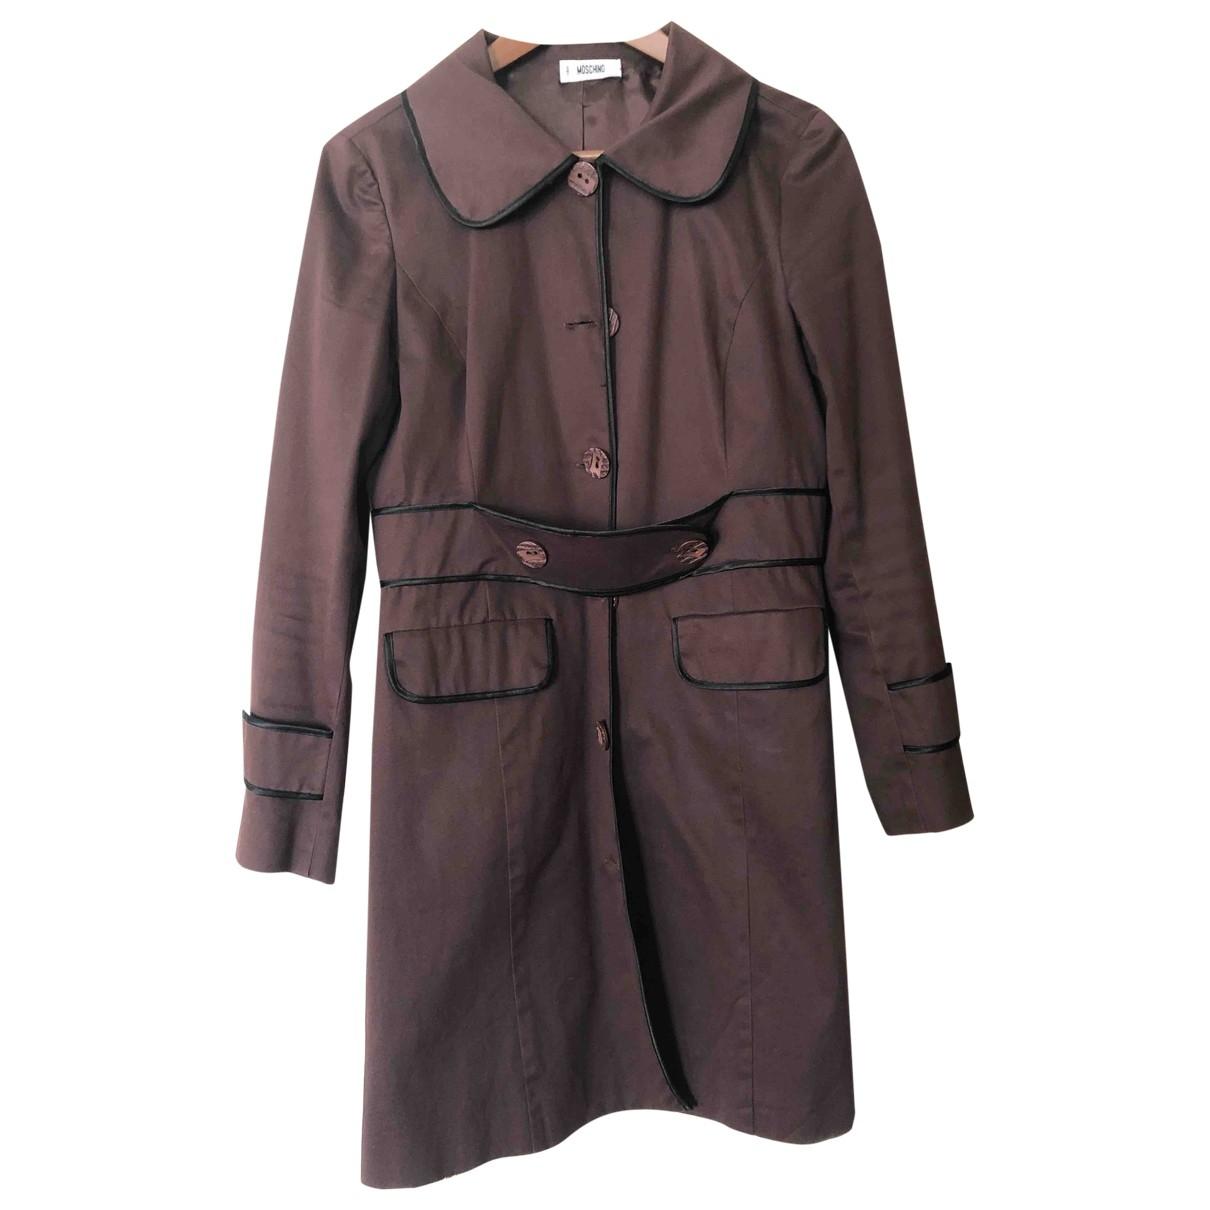 Moschino \N Brown Cotton coat for Women L International